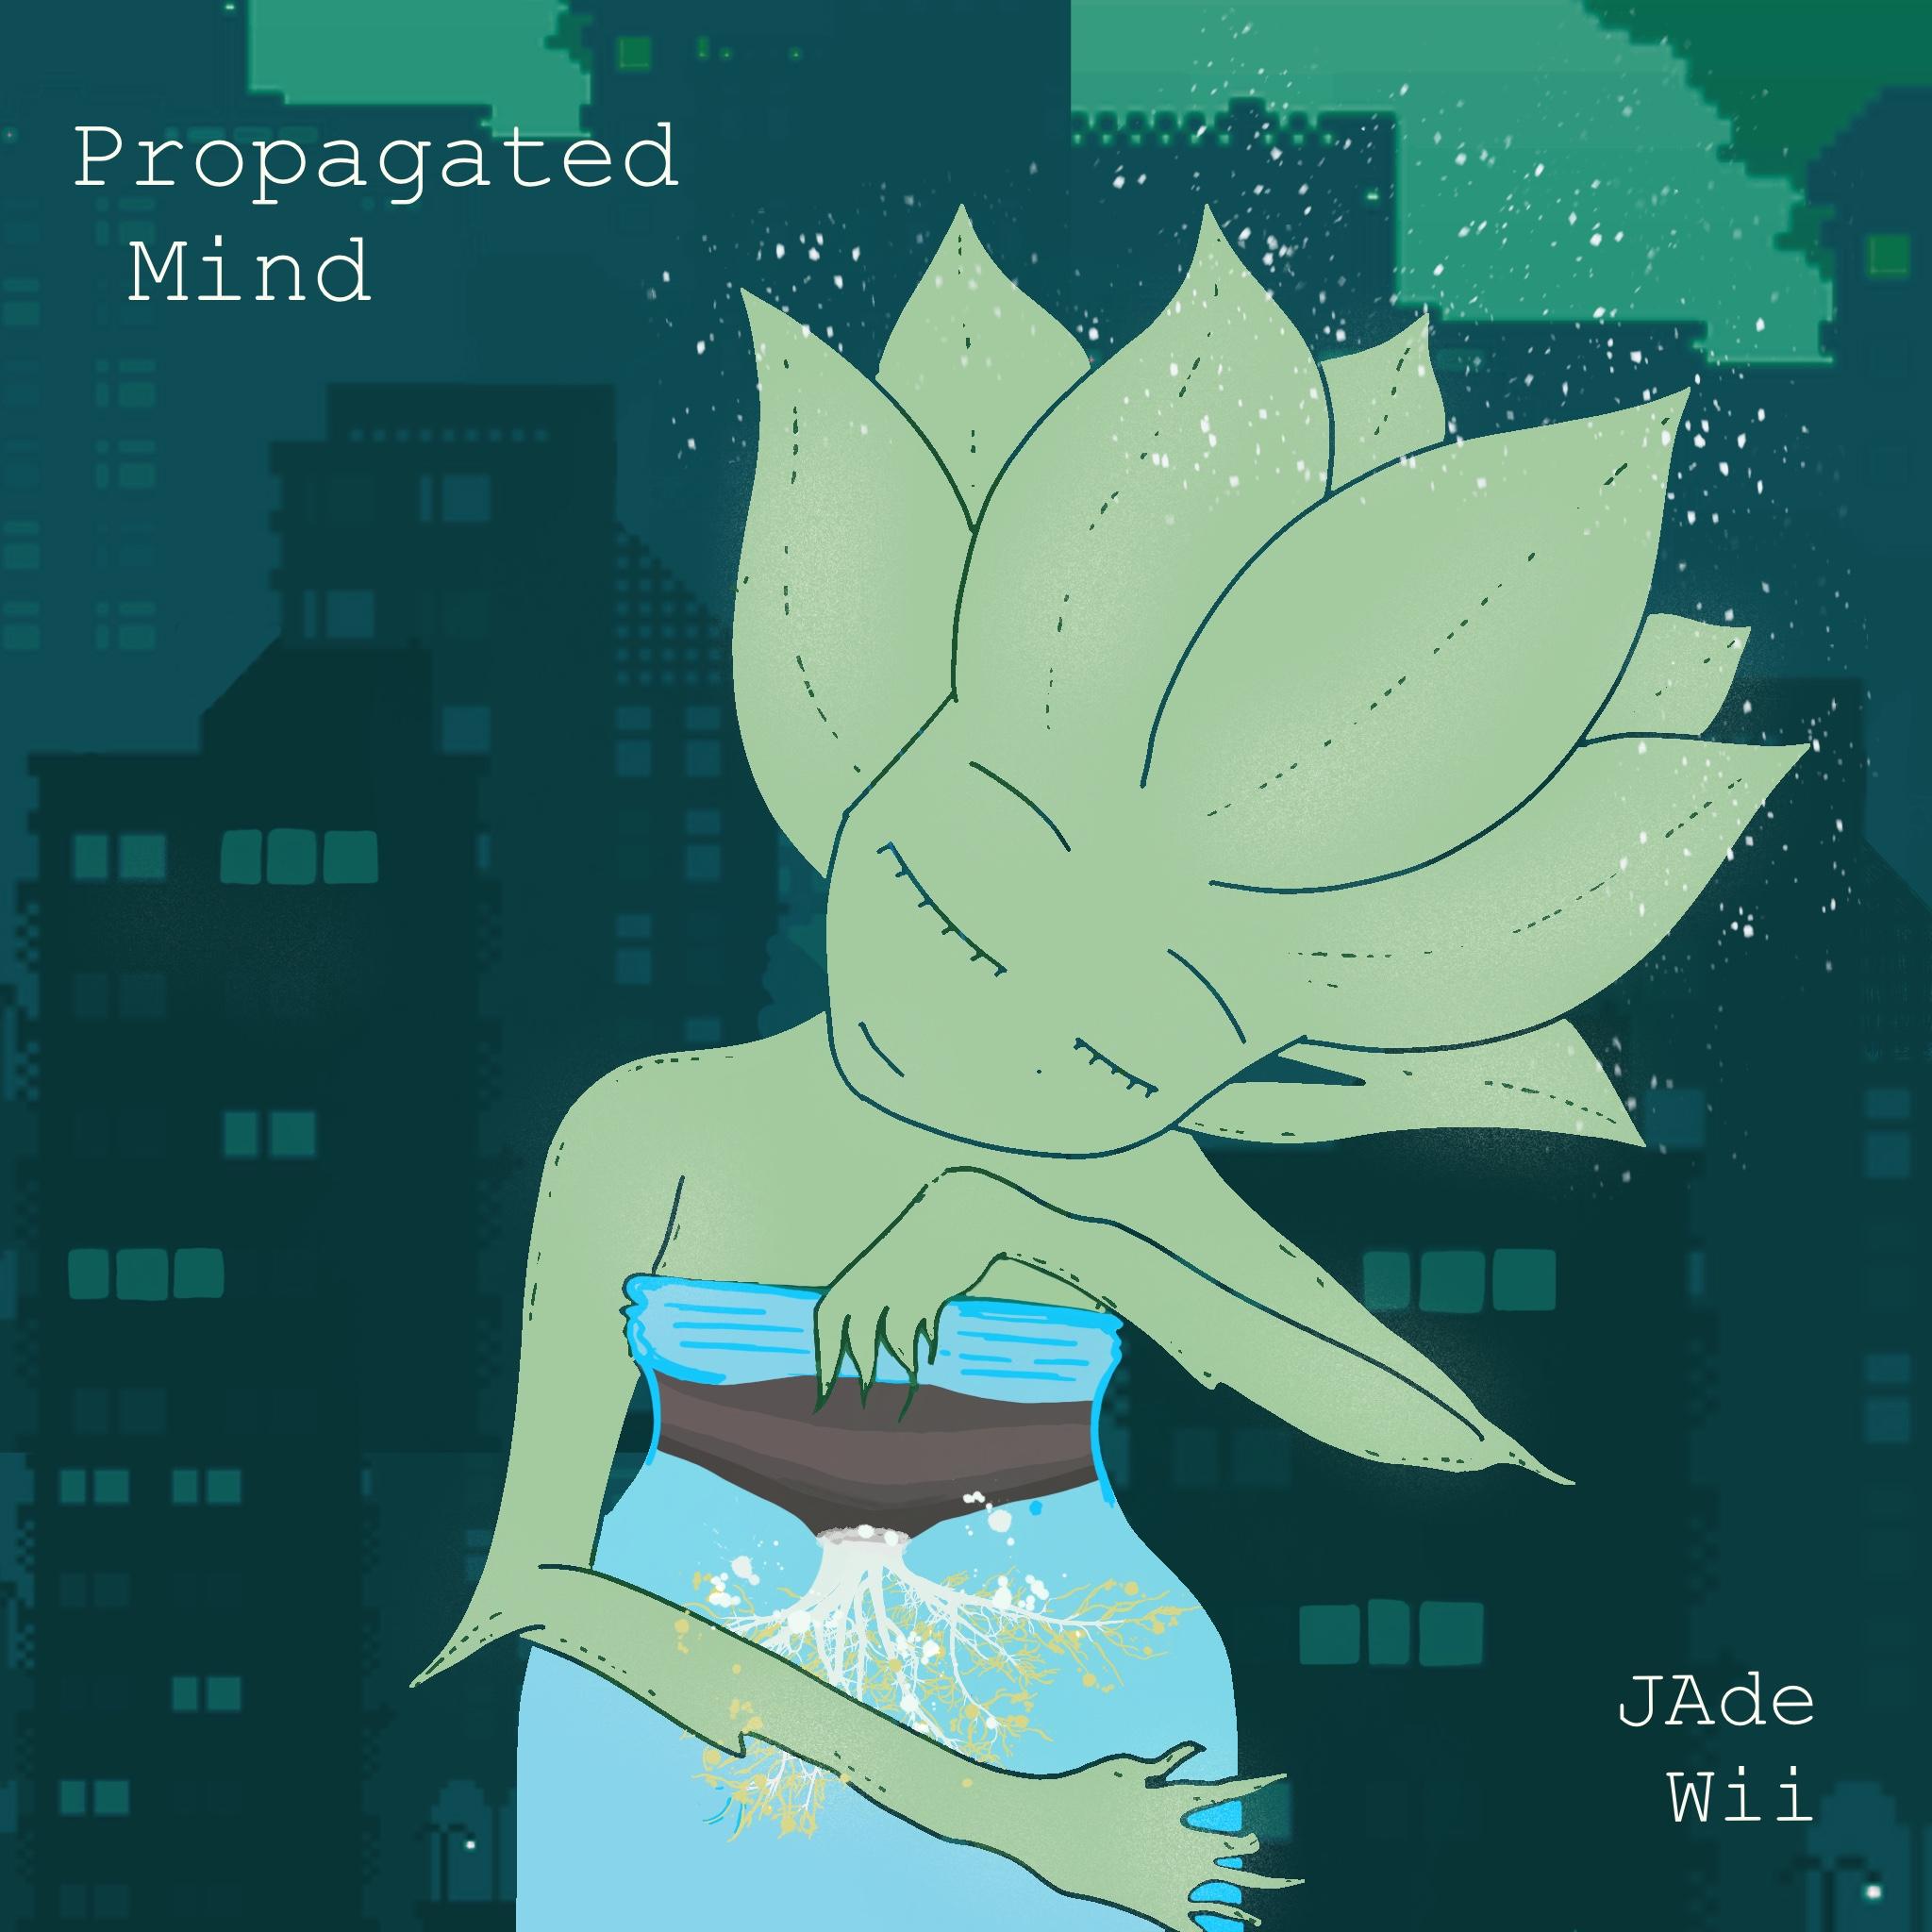 Propagated Mind